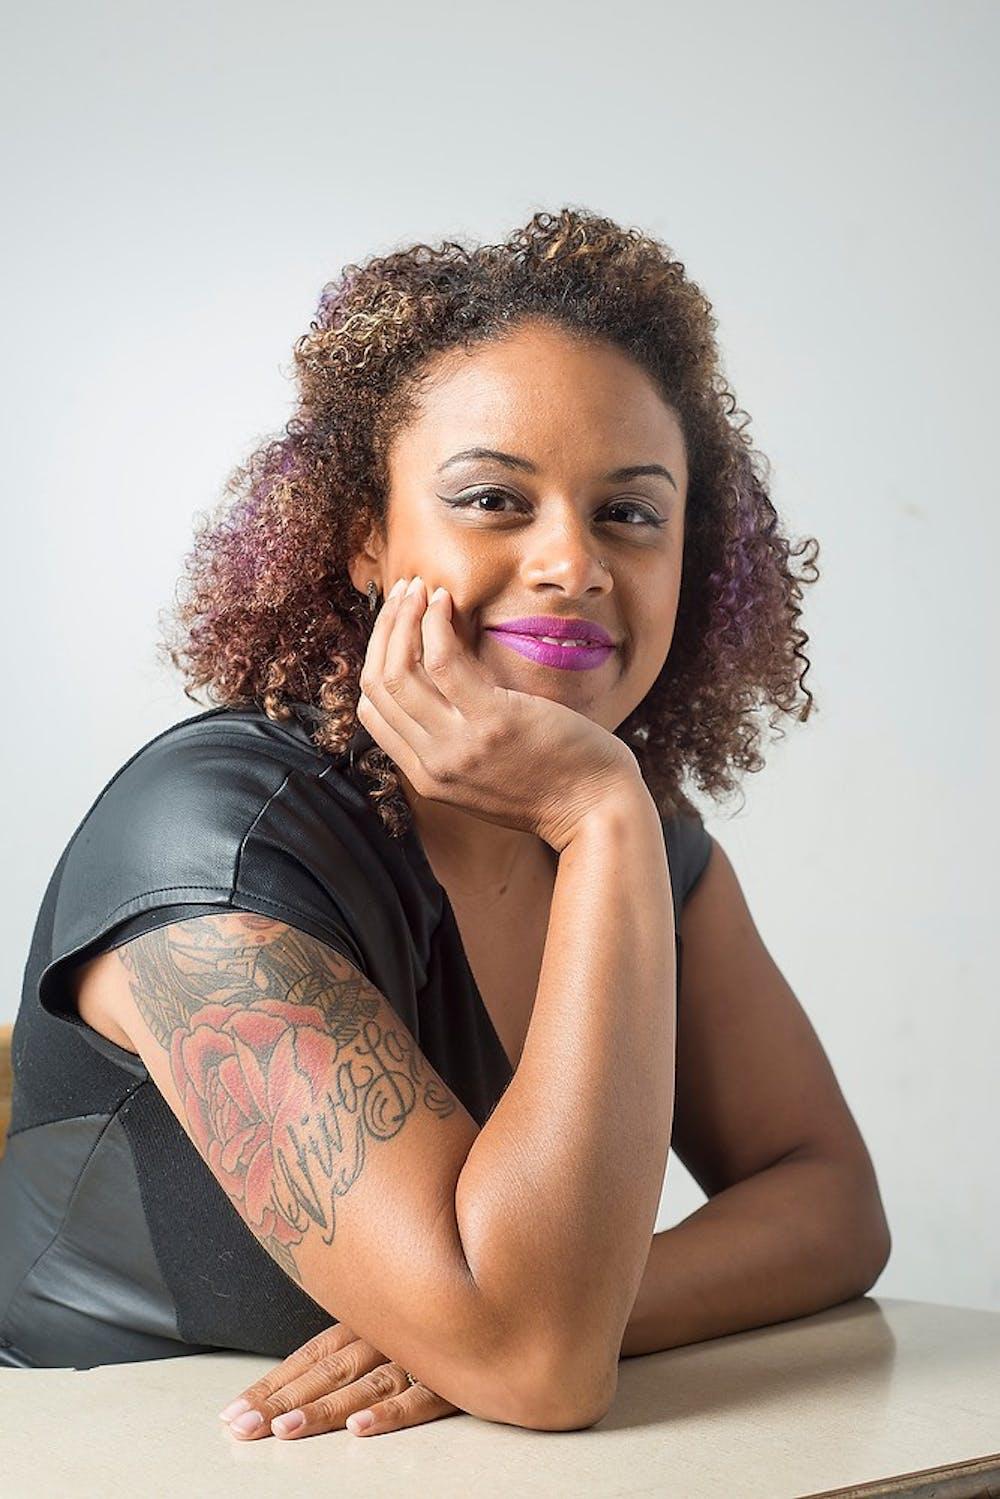 <p>Executive Director of The Firecracker Foundation Tashmica Torok poses for a portrait Sept. 10, 2014. Torok has six tattoos. Julia Nagy/The State News</p>